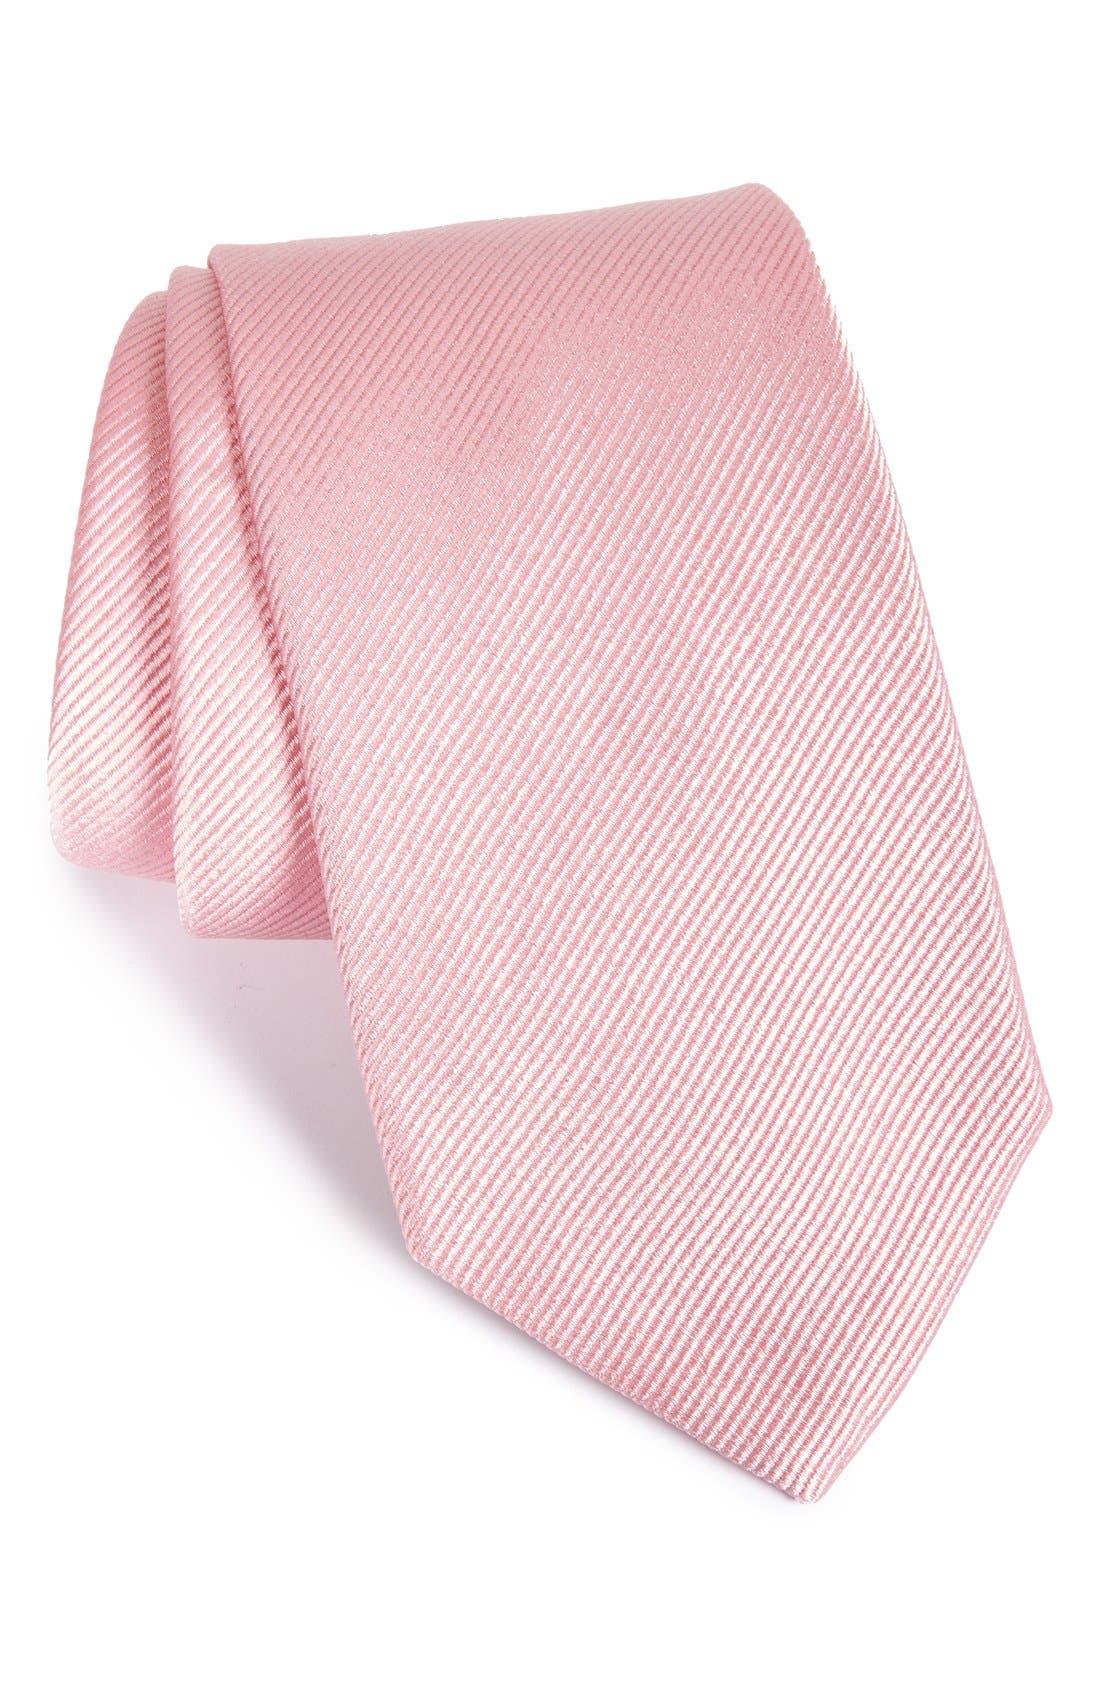 Main Image - Gitman Solid Silk Tie